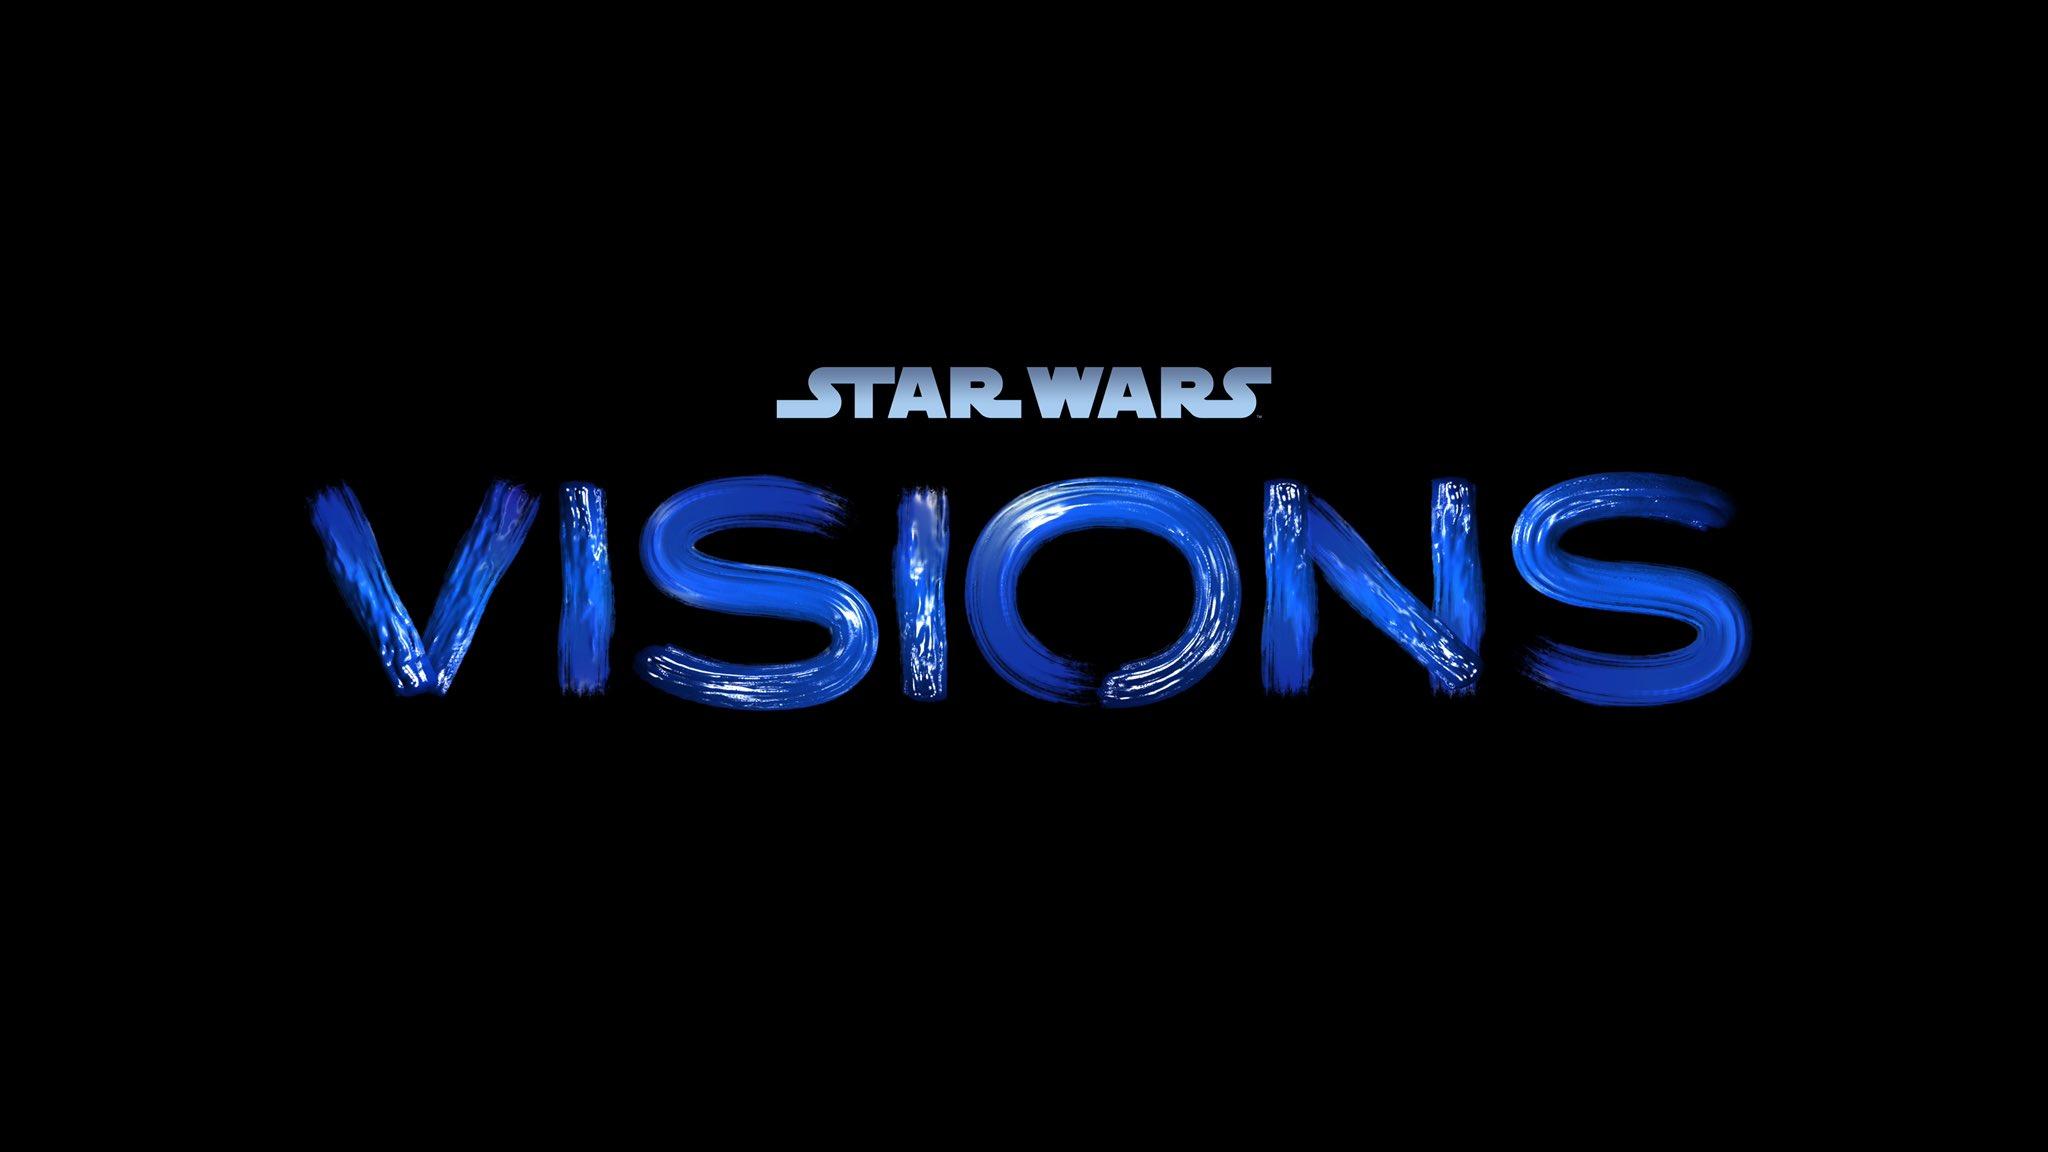 Series de Star Wars Visions